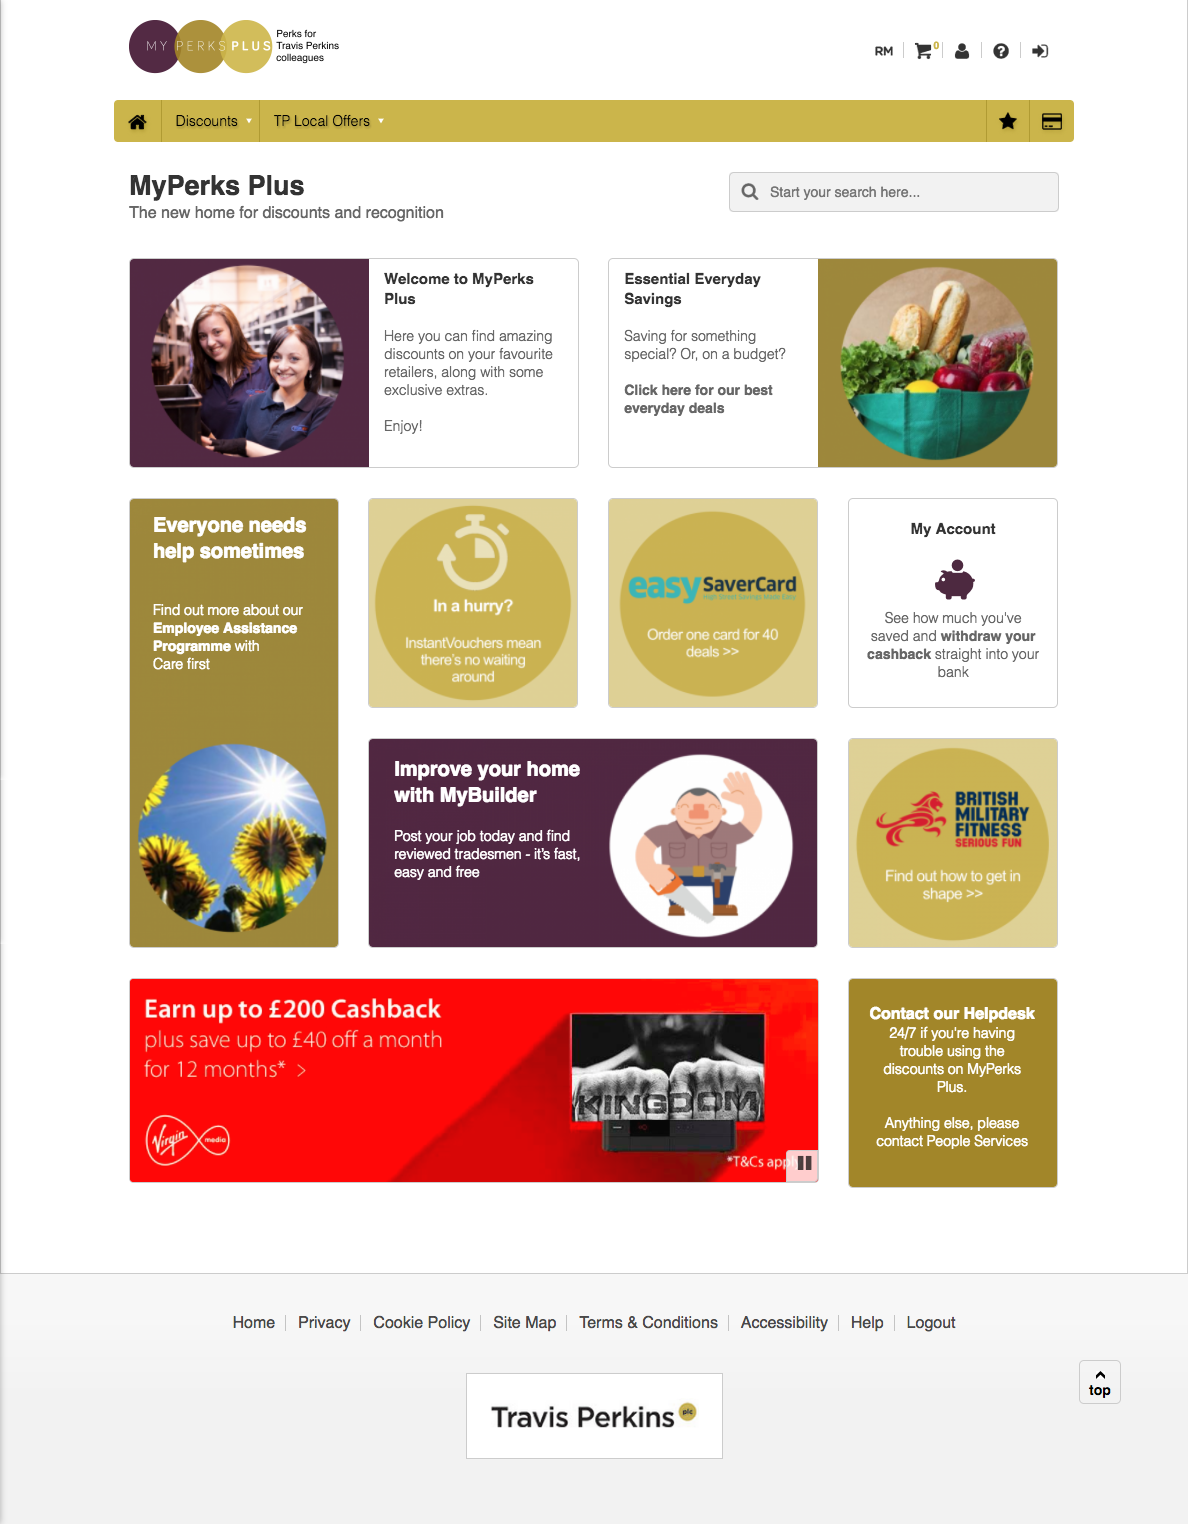 travis-perkins-engagement-platform.png